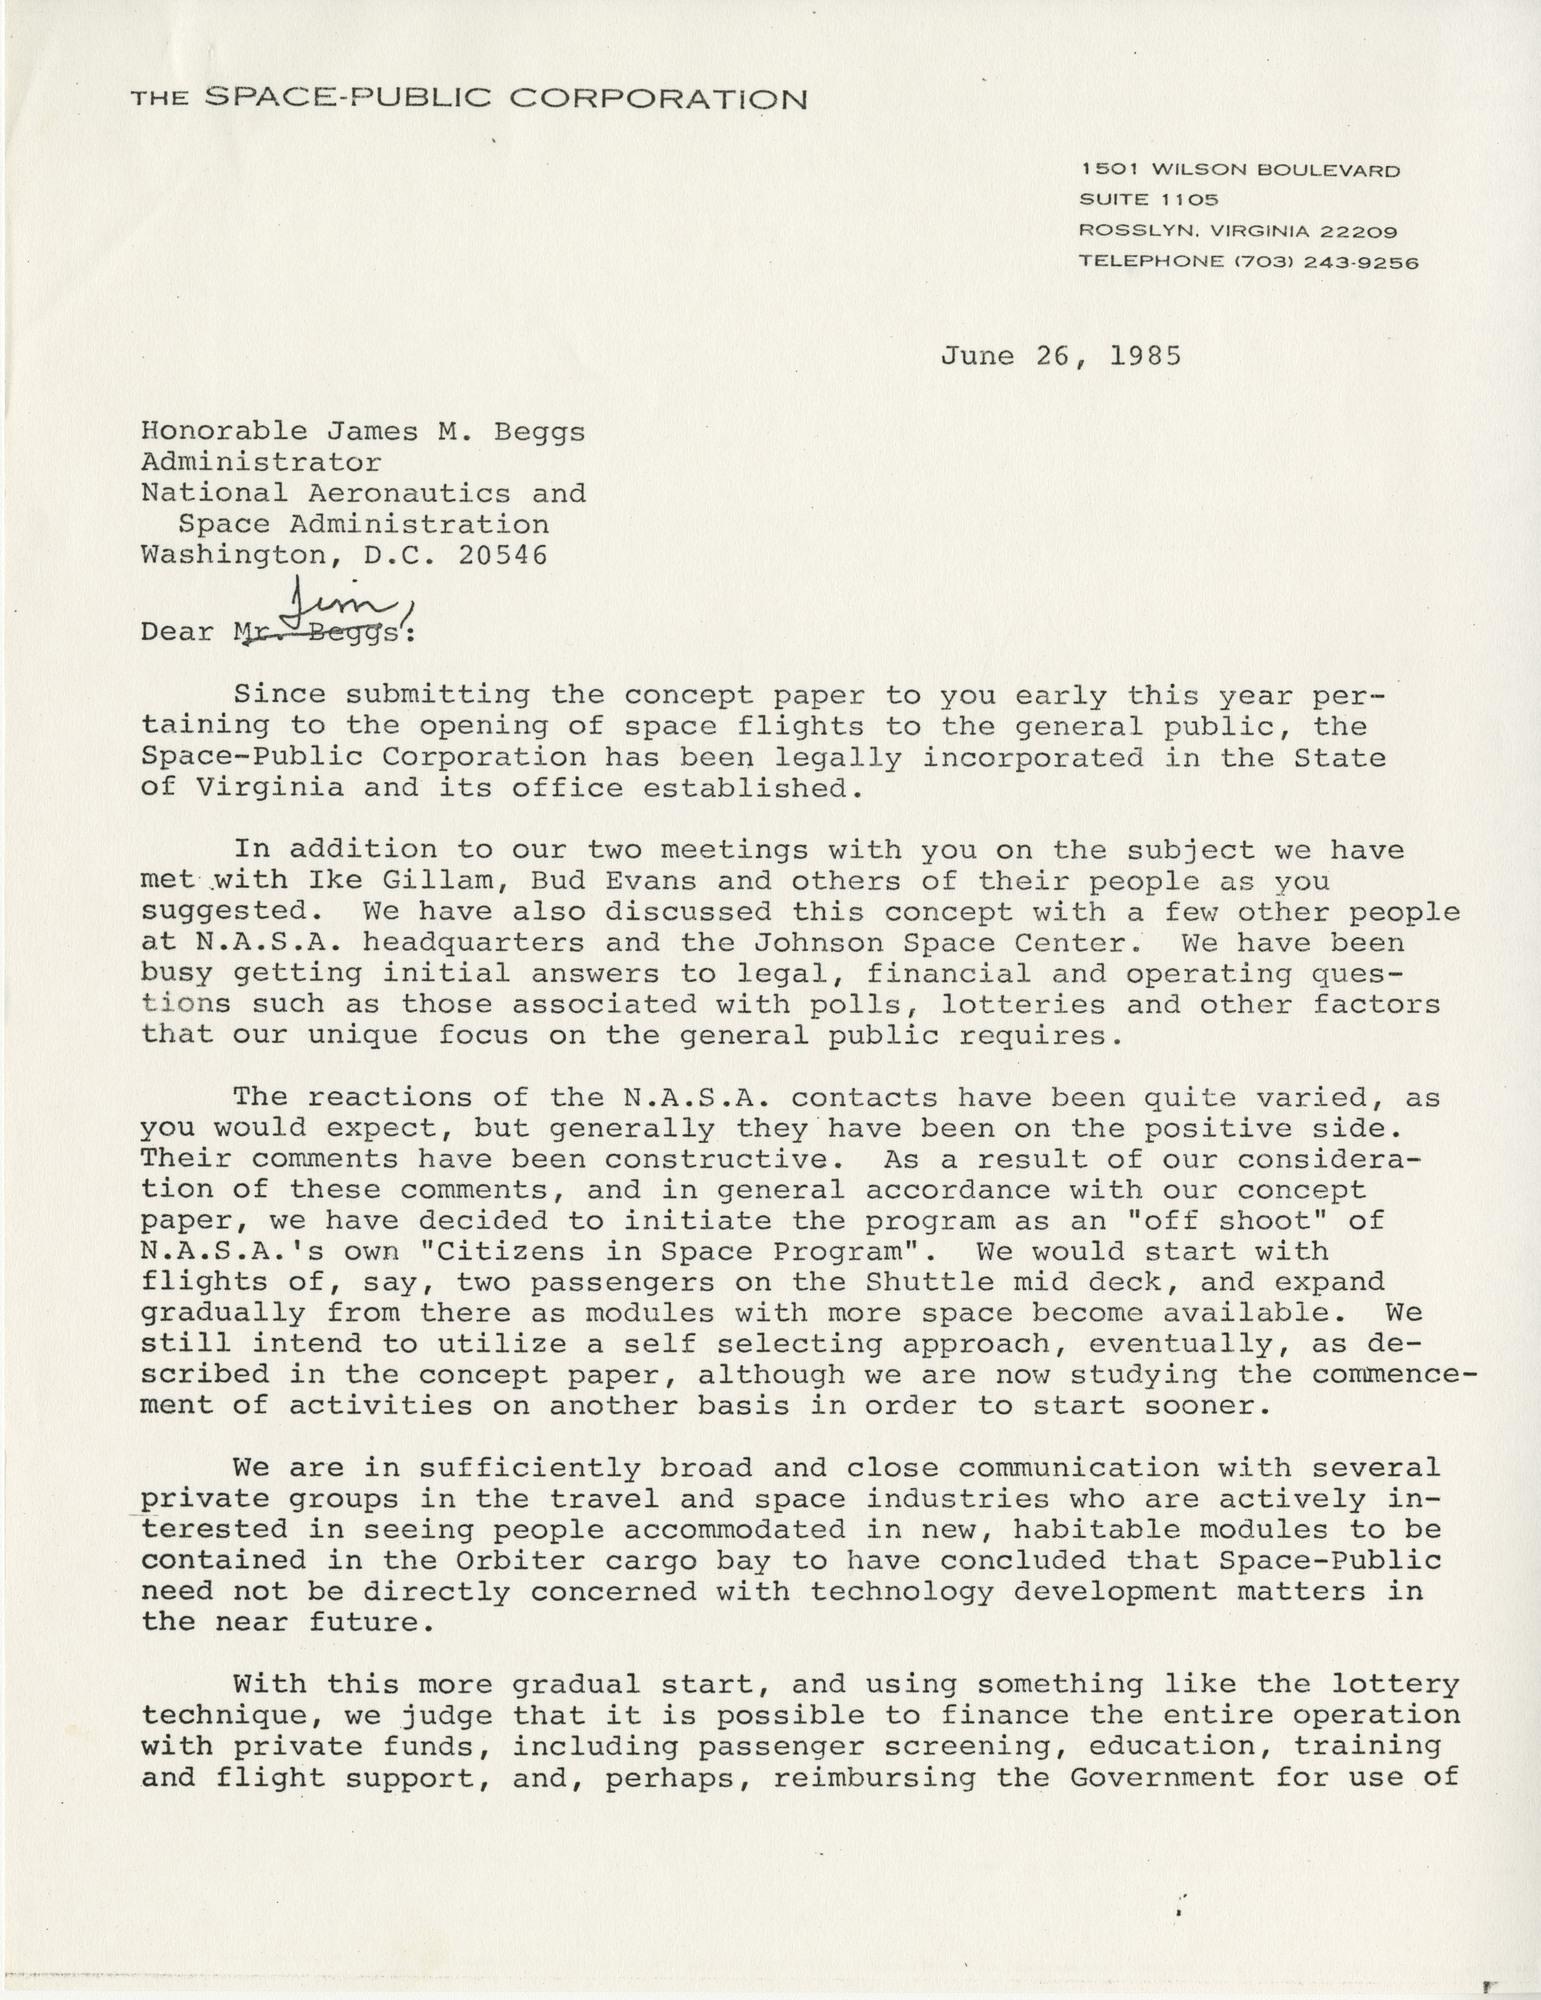 Ms1989-029_B19_F13_Letter_1985_0626_1a.jpg